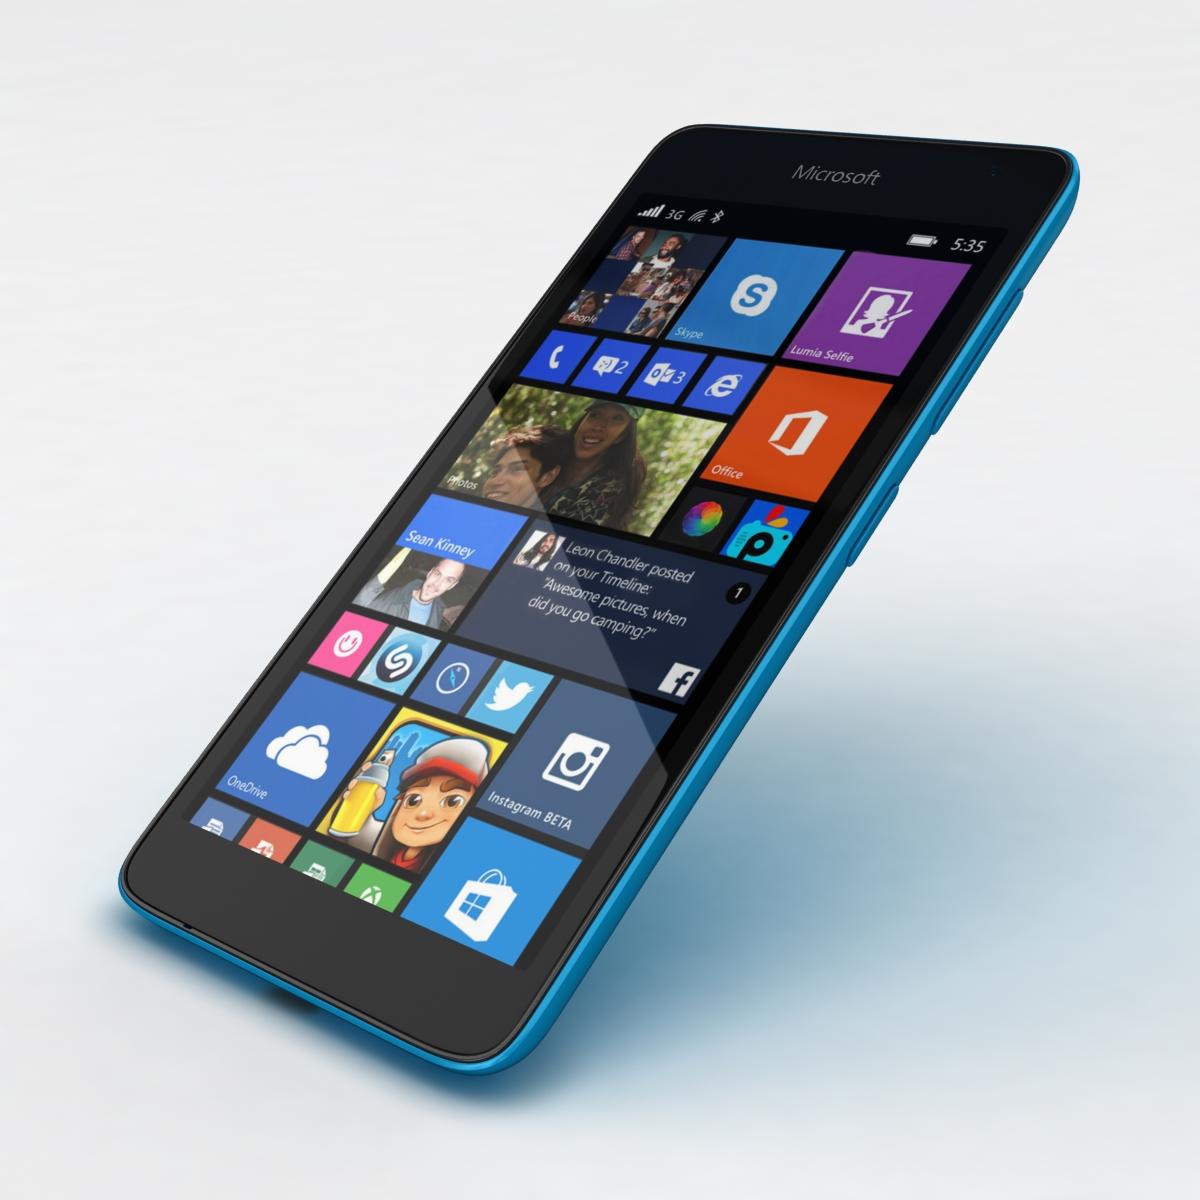 microsoft lumia 535 and dual sim blue 3d model 3ds max fbx c4d obj 204534